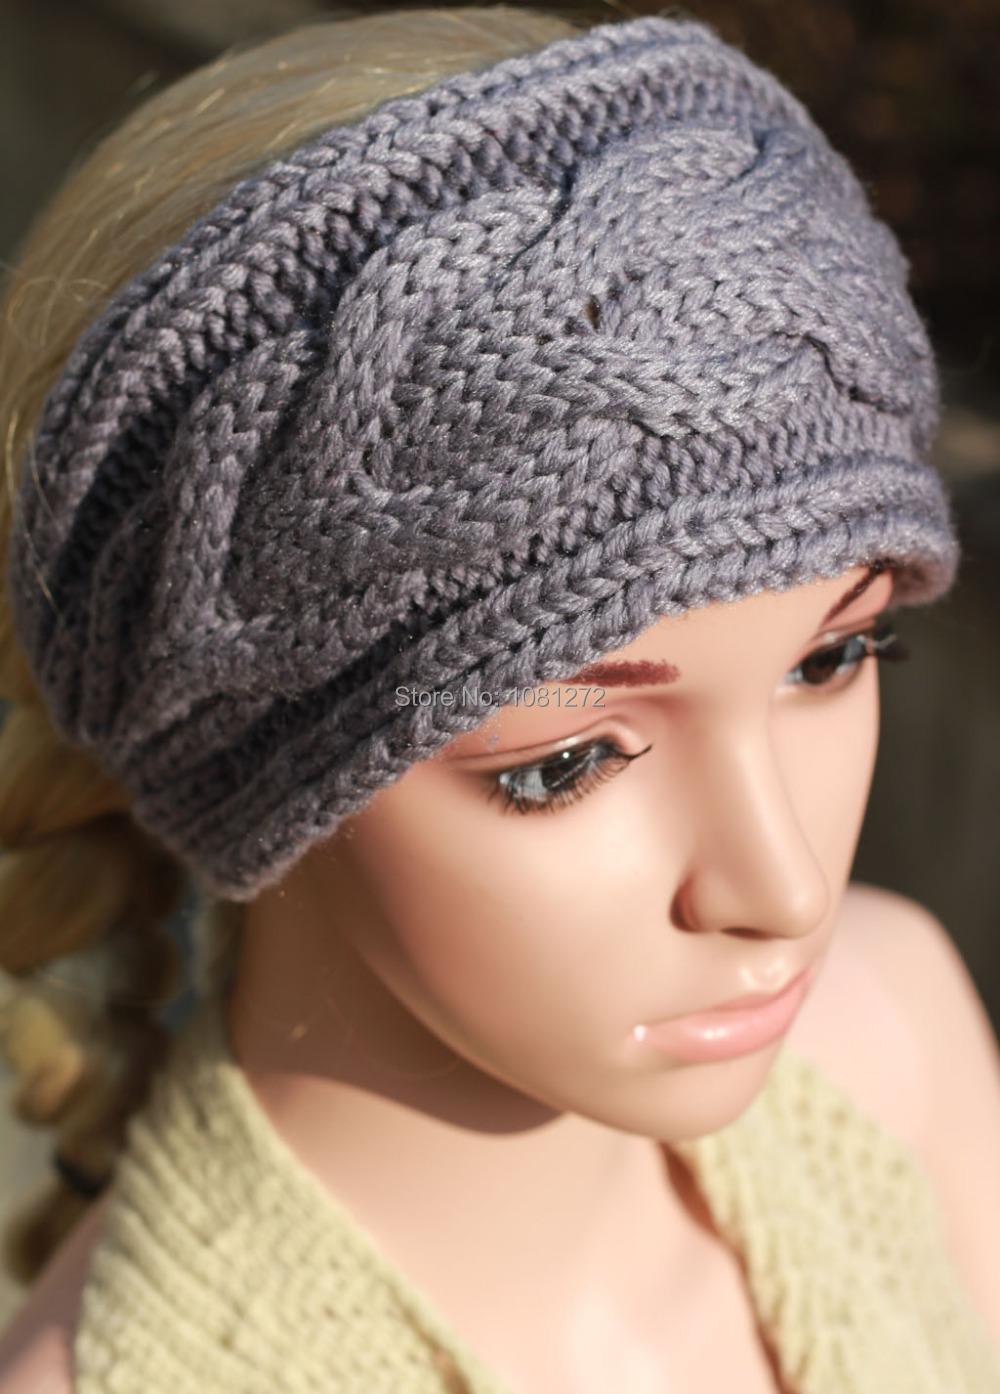 Fantastic Head Wrap Knitting Pattern Illustration - Sewing Pattern ...